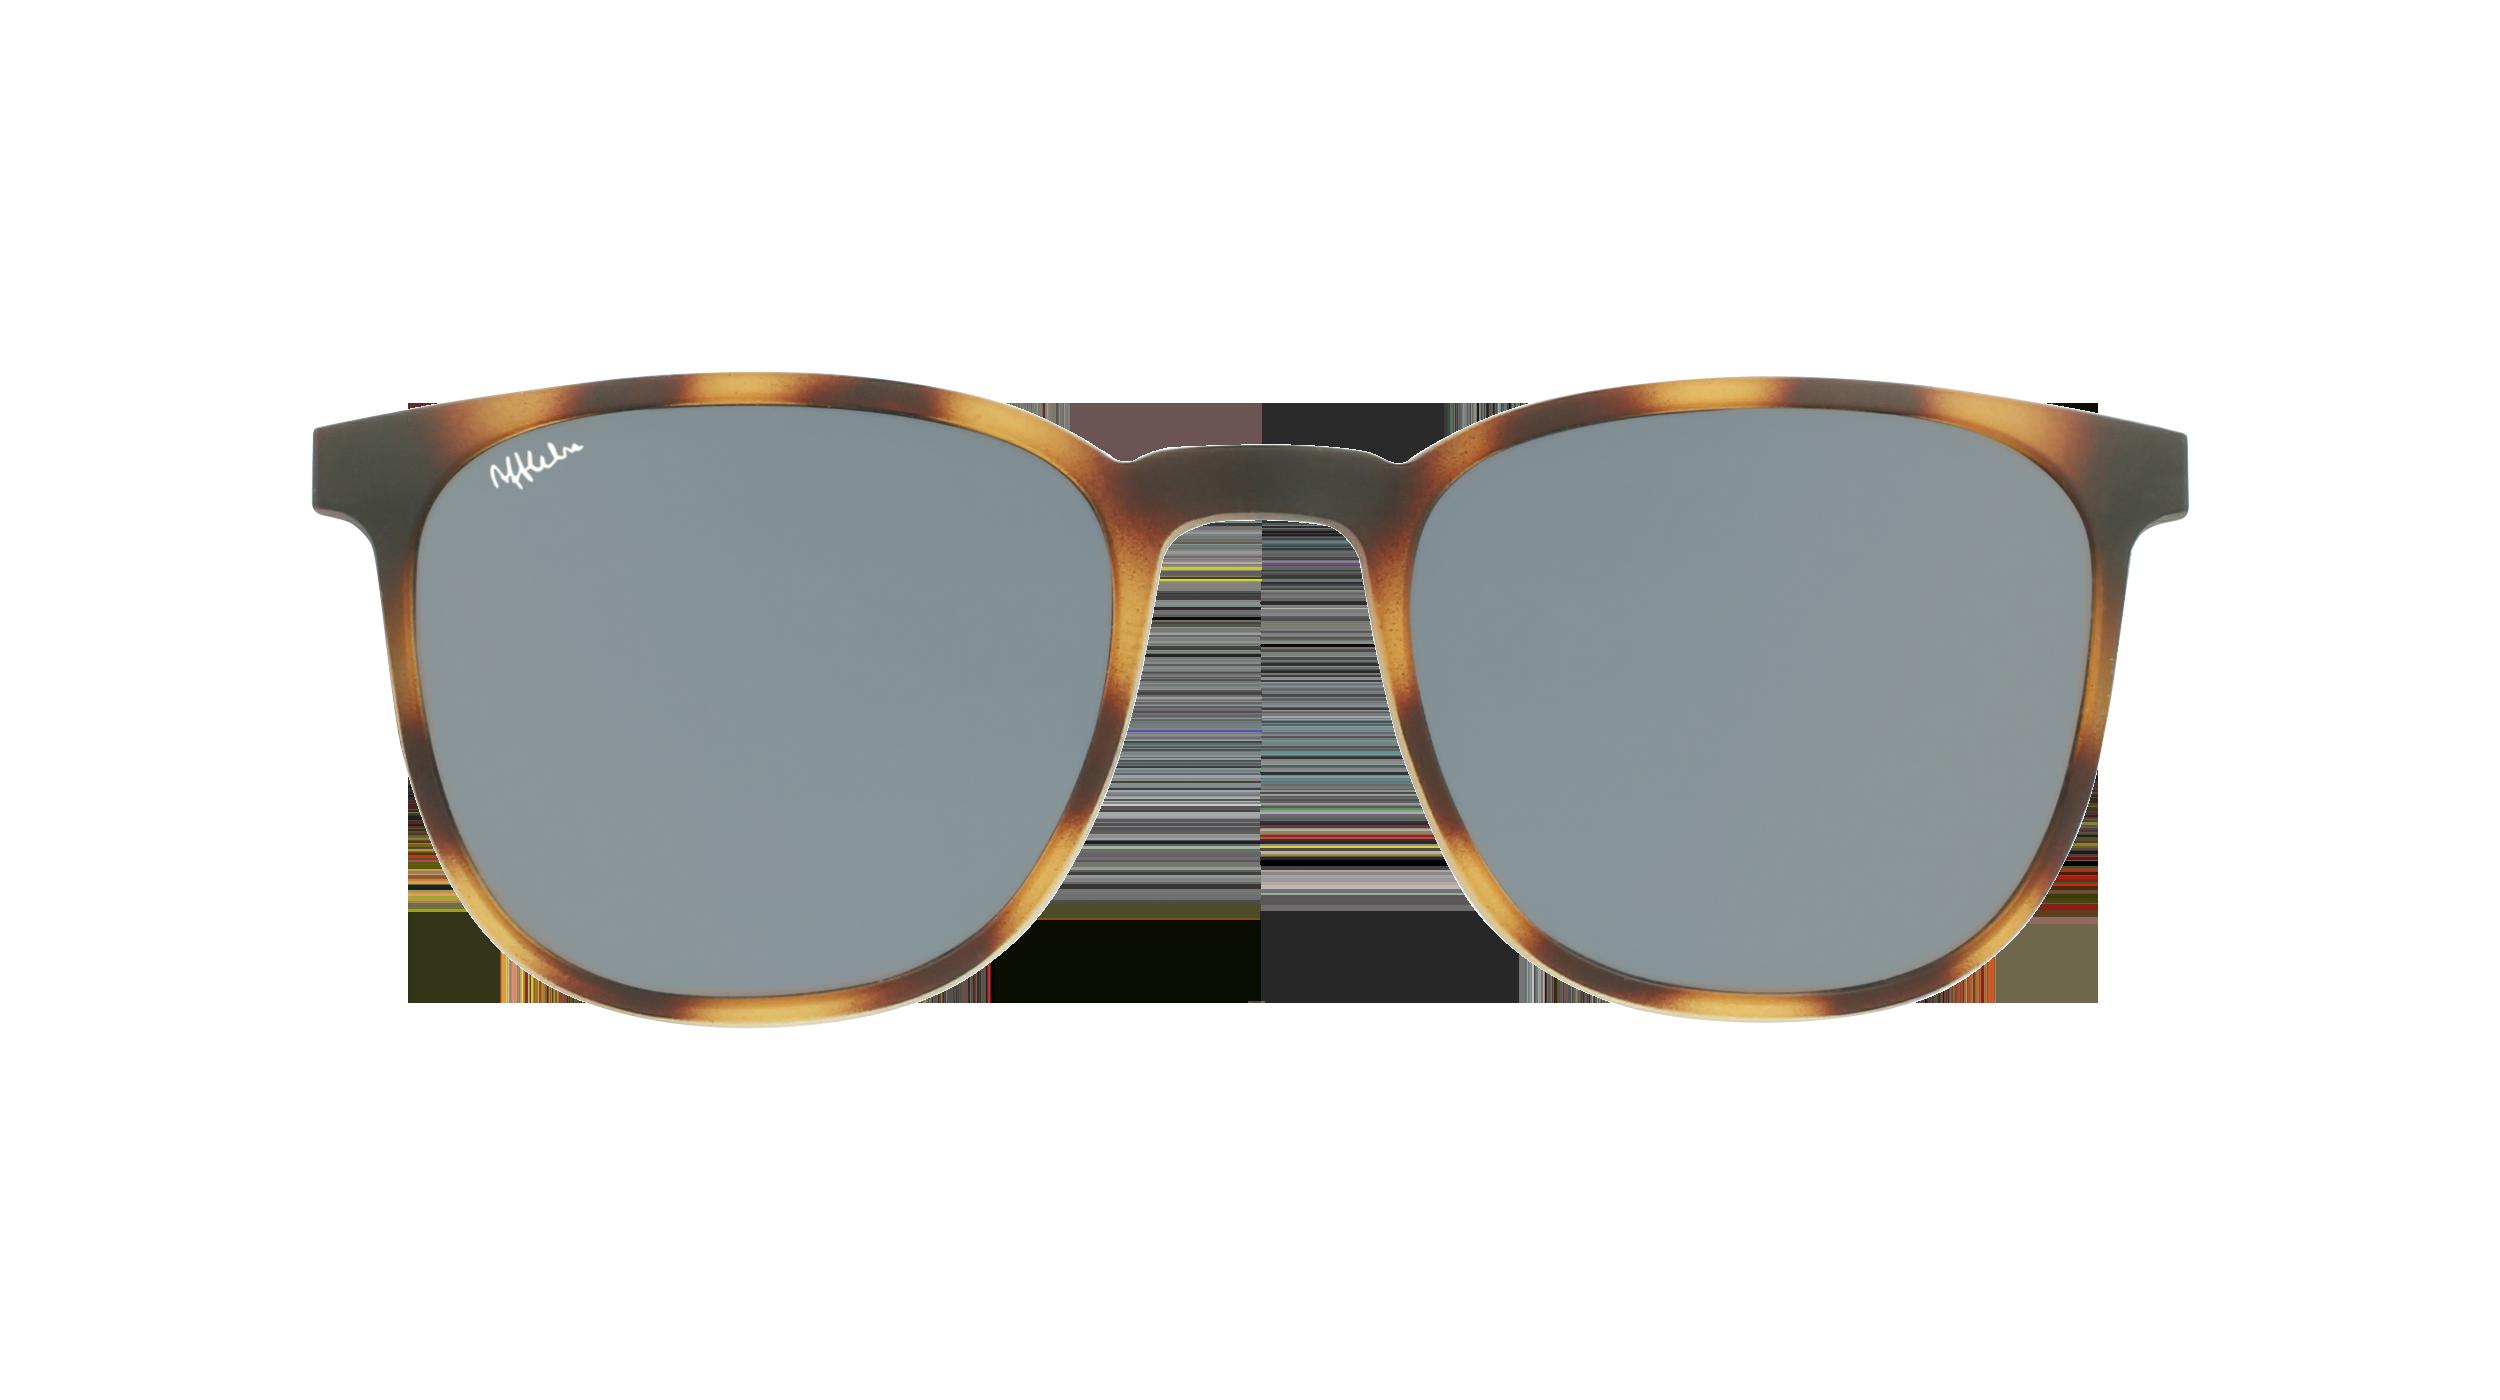 afflelou/france/products/smart_clip/clips_glasses/07630036457320.png